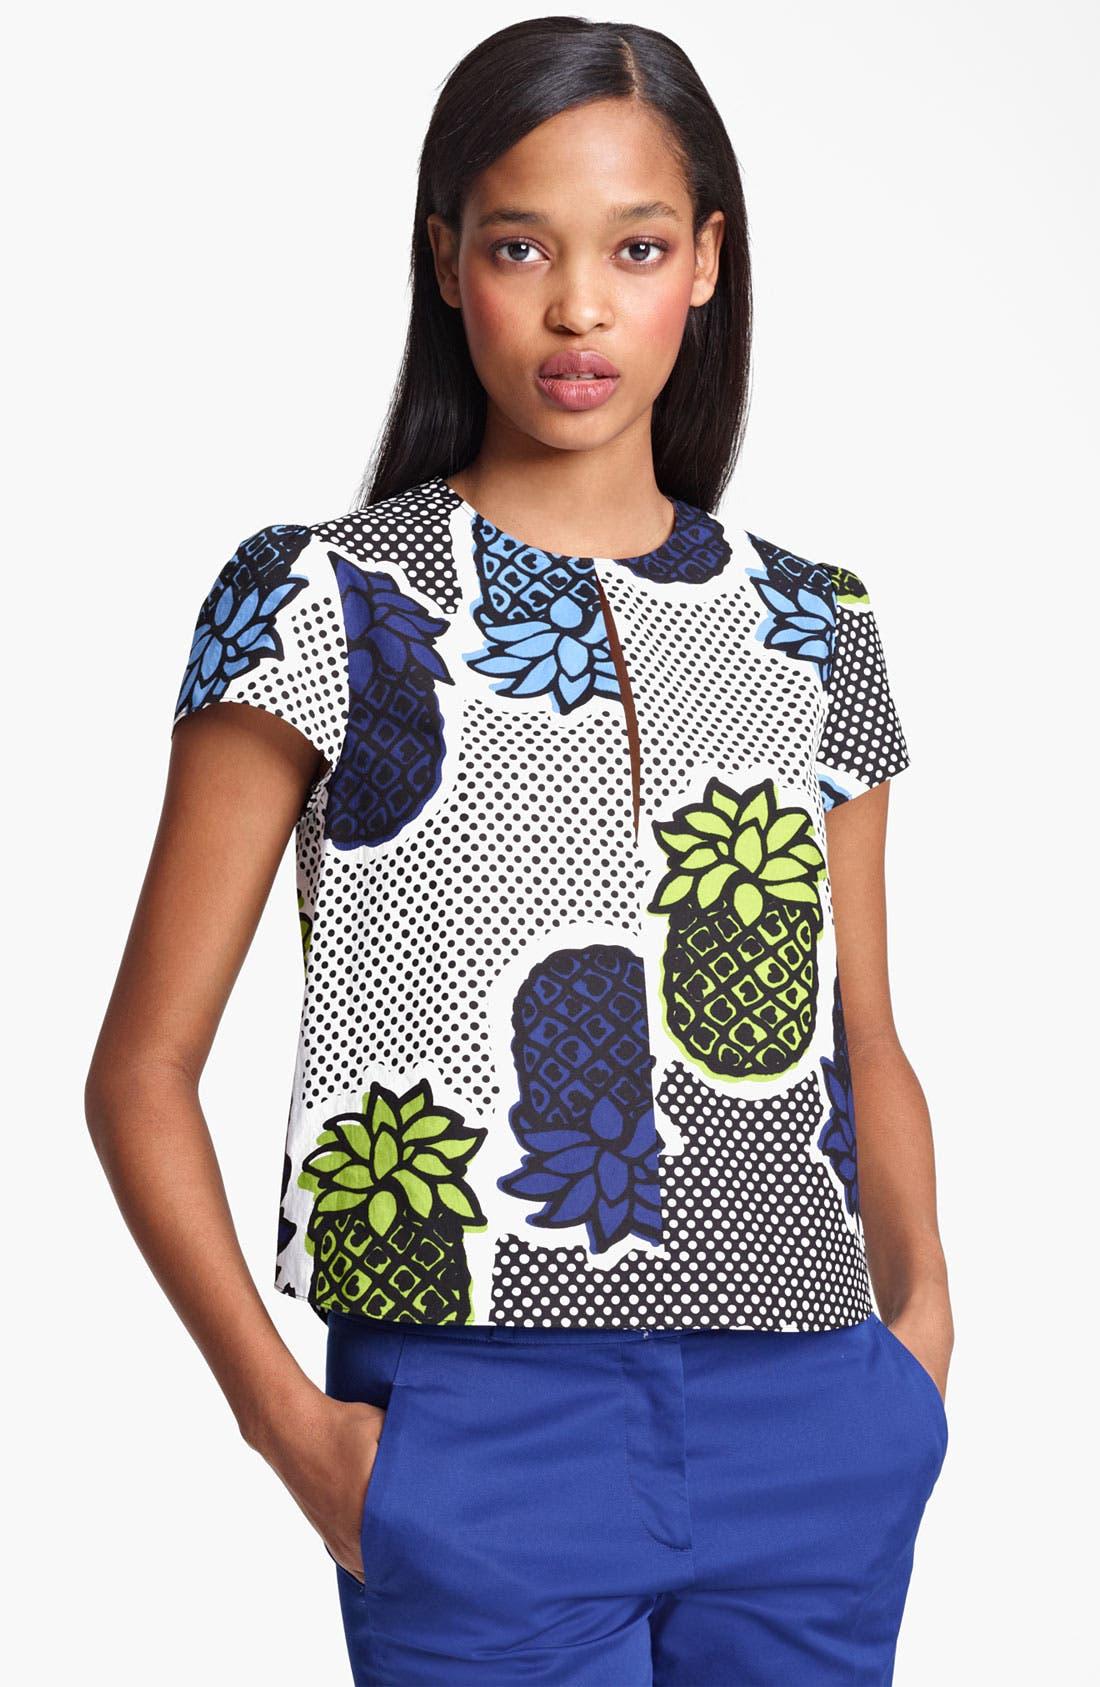 Main Image - Moschino Cheap & Chic Pineapple Print Blouse